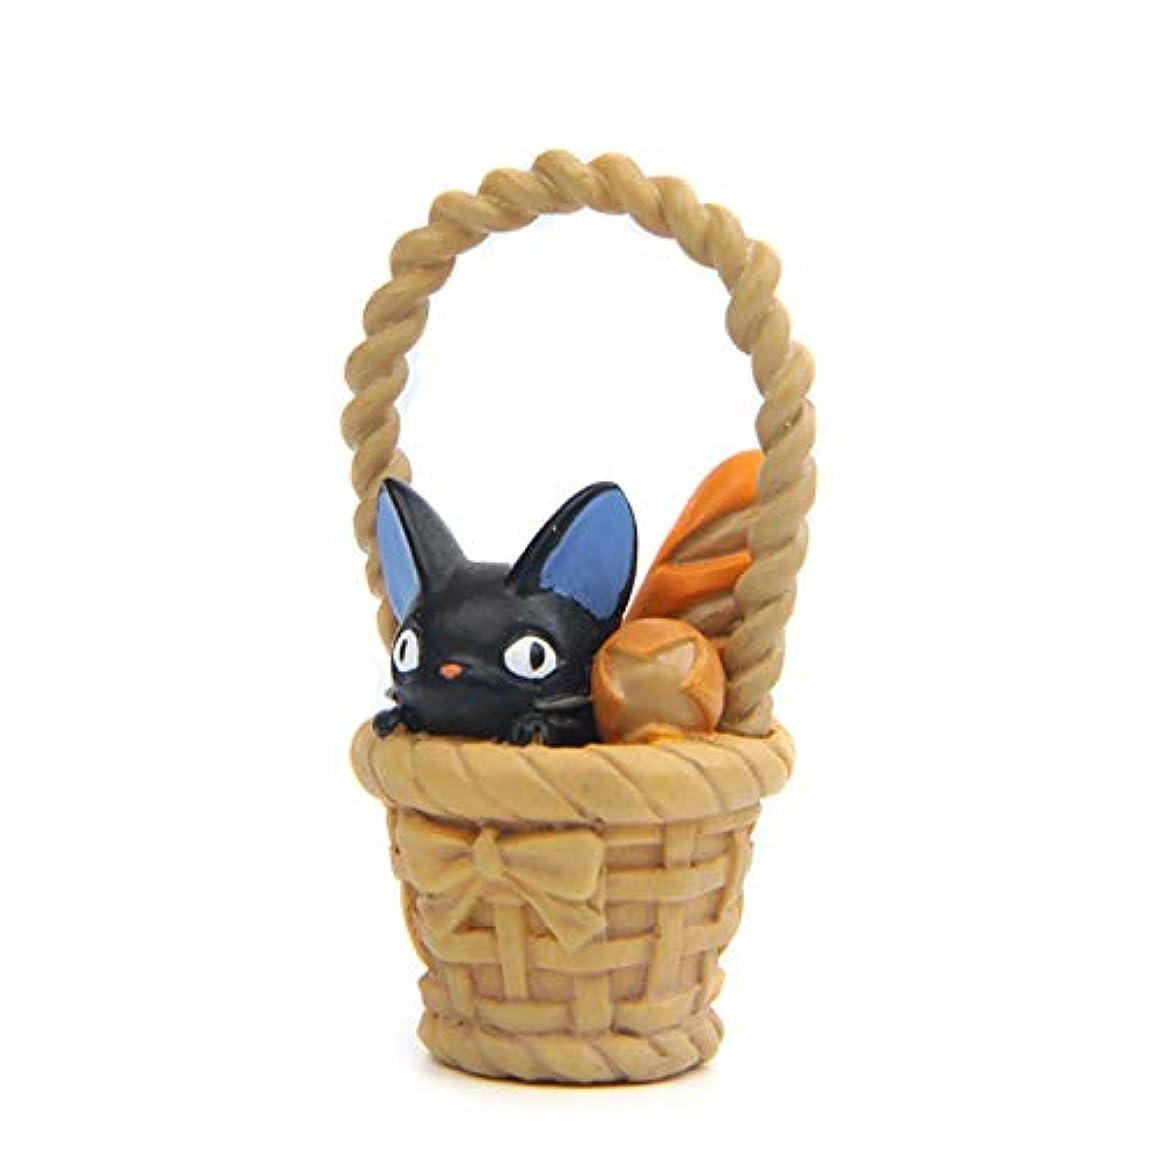 BoldType Kiki Cat - 1pcs Studio Ghibli Miyazaki Kiki's Delivery Service Cat Basket DIY PVC Action Figure Toys Model Kids Toy for Garden Ornaments 1 PCs